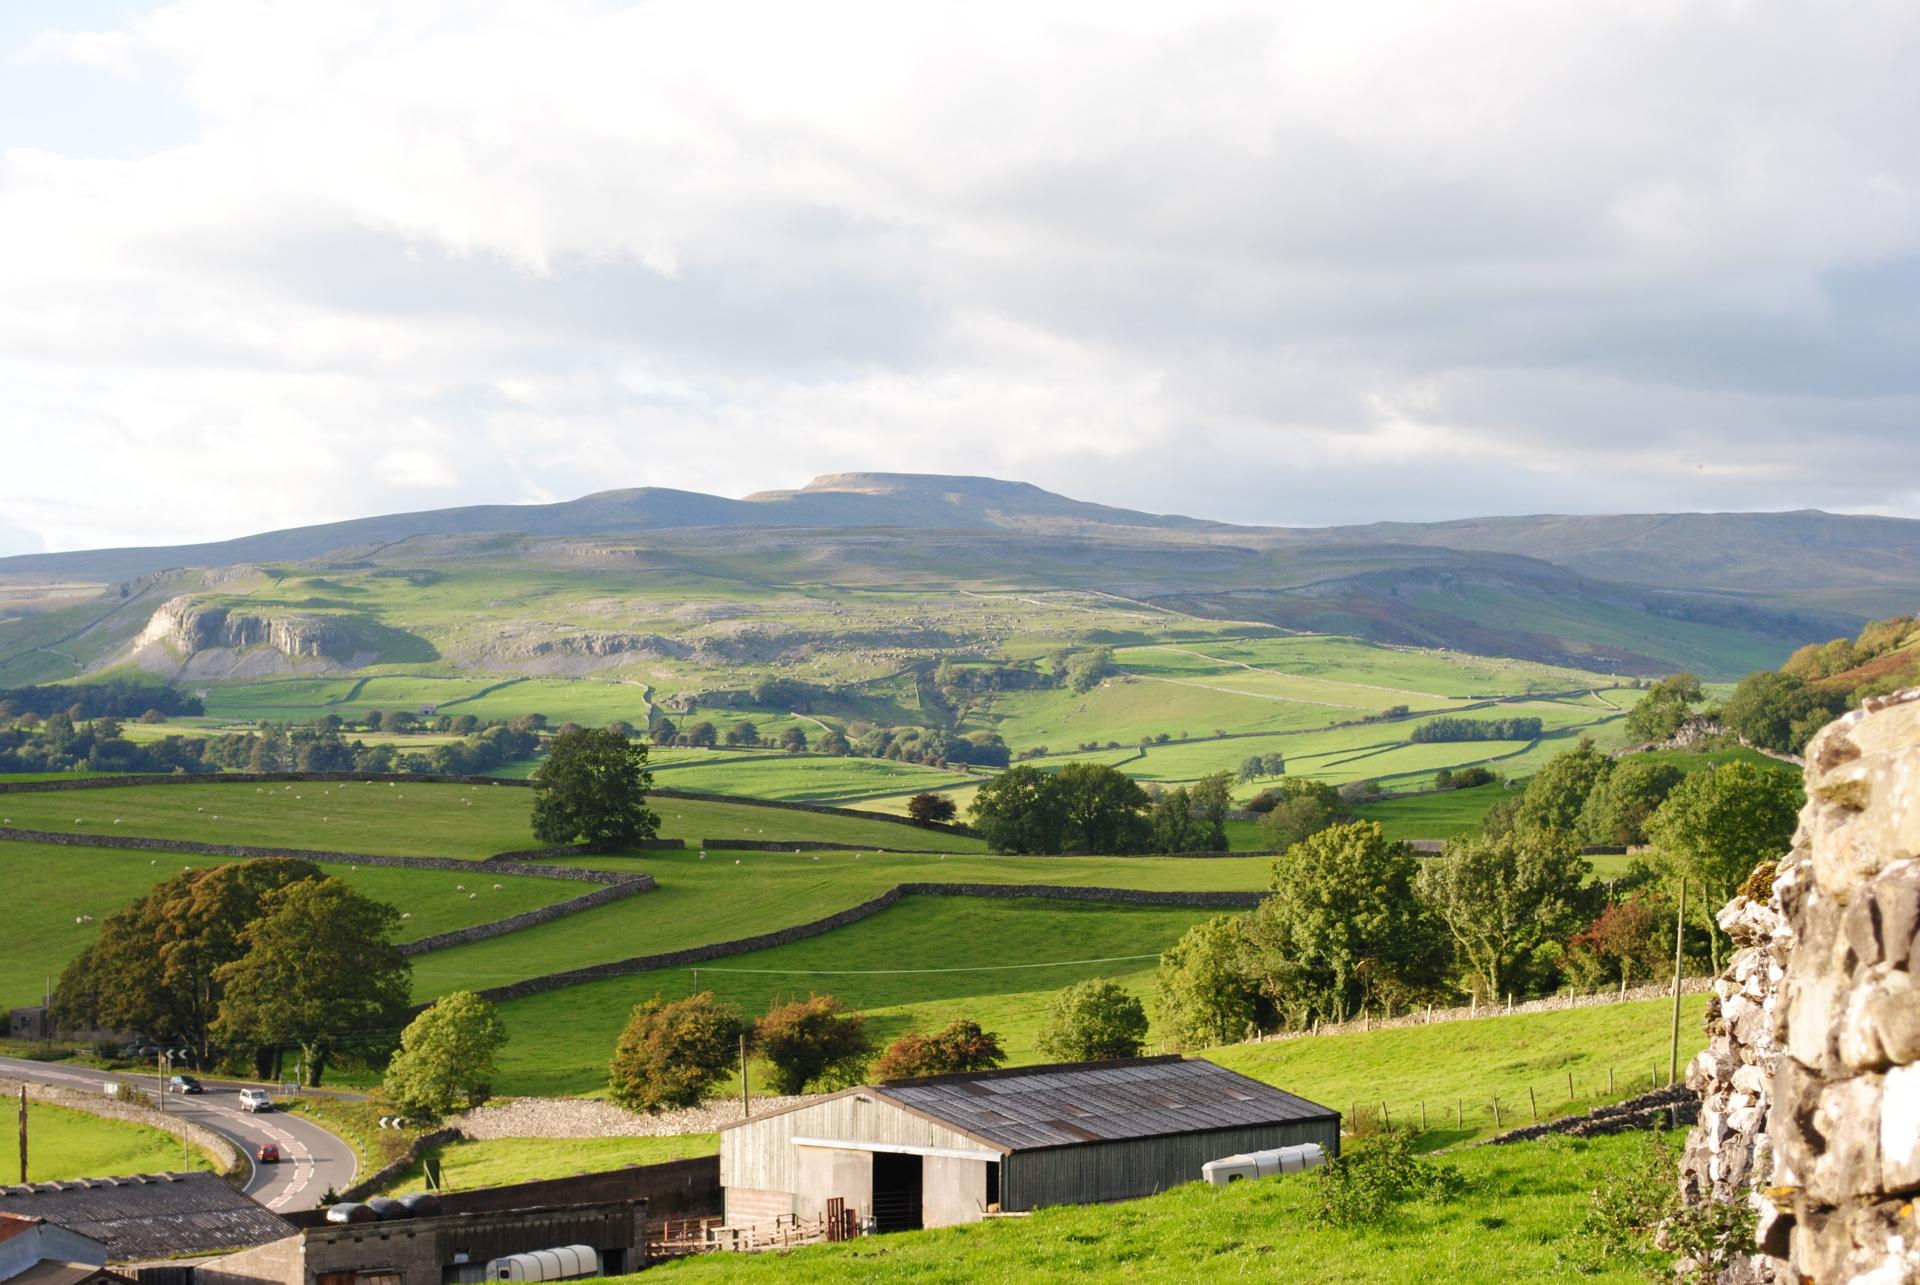 Rawlinshaw Farm, Yorkshire Dales National park